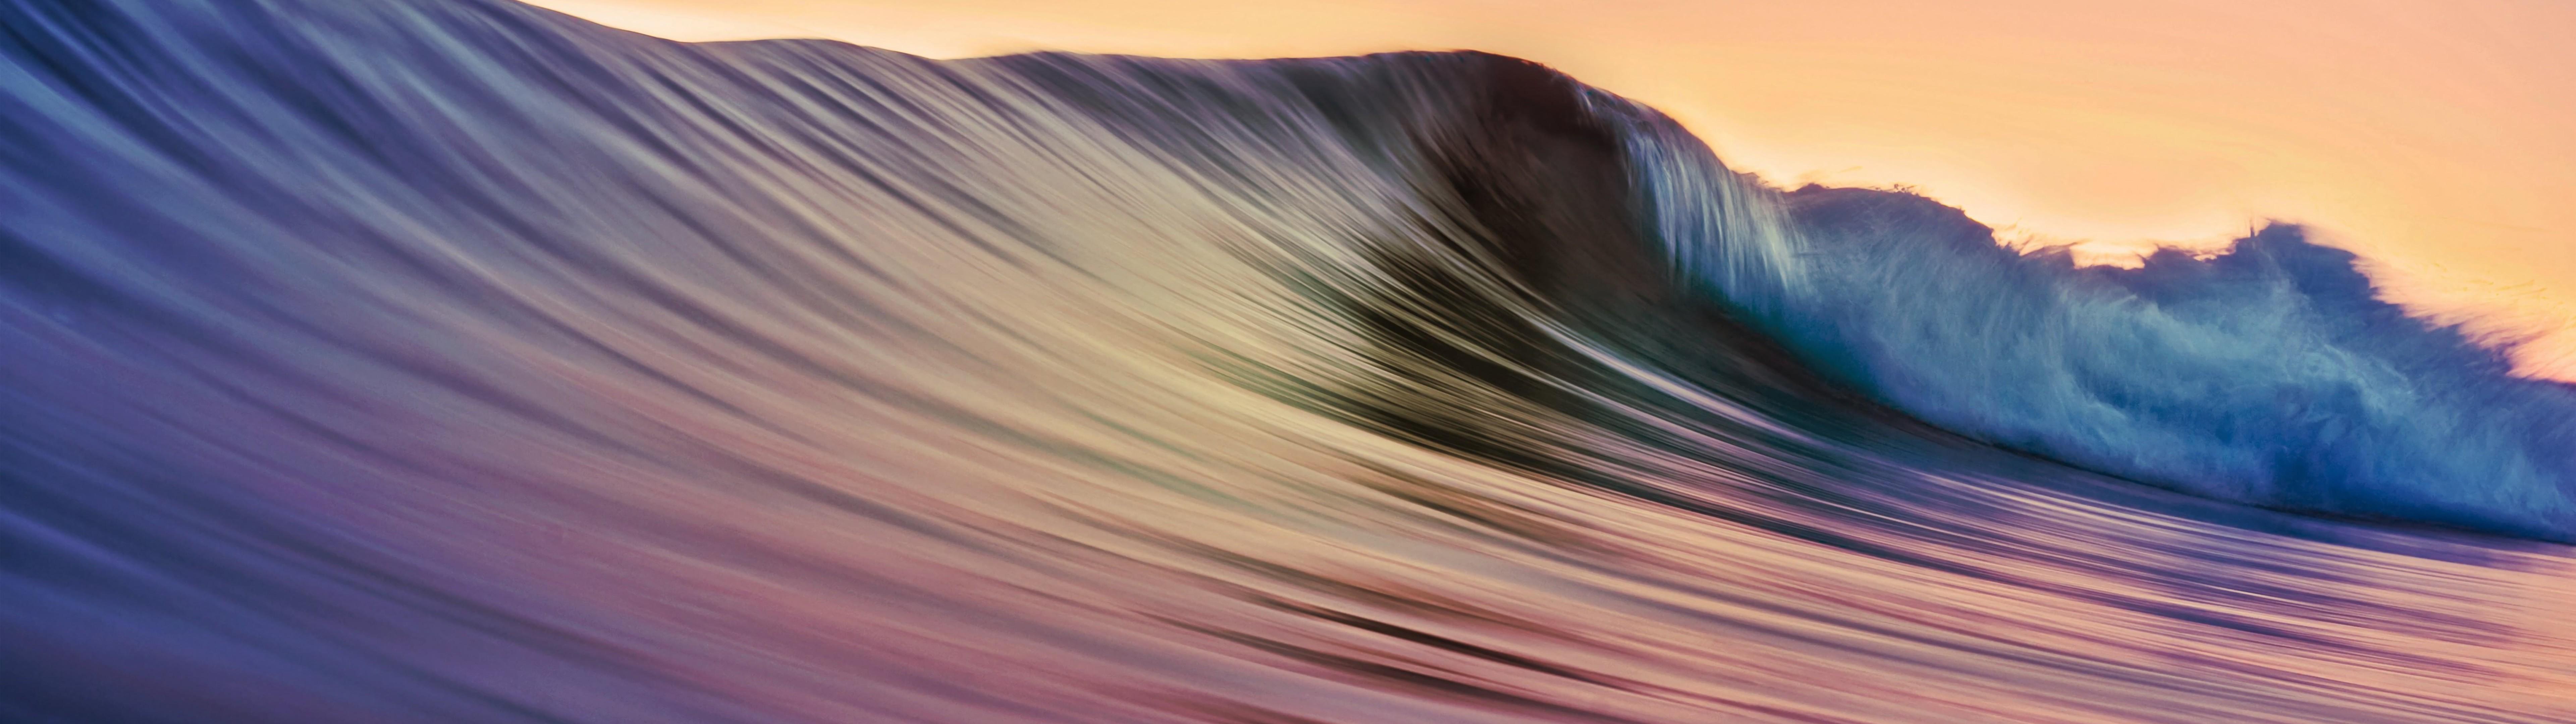 Ocean, Waves, Nature, Scenery, 8k, - 4k Ultra Hd Dual Monitor - HD Wallpaper